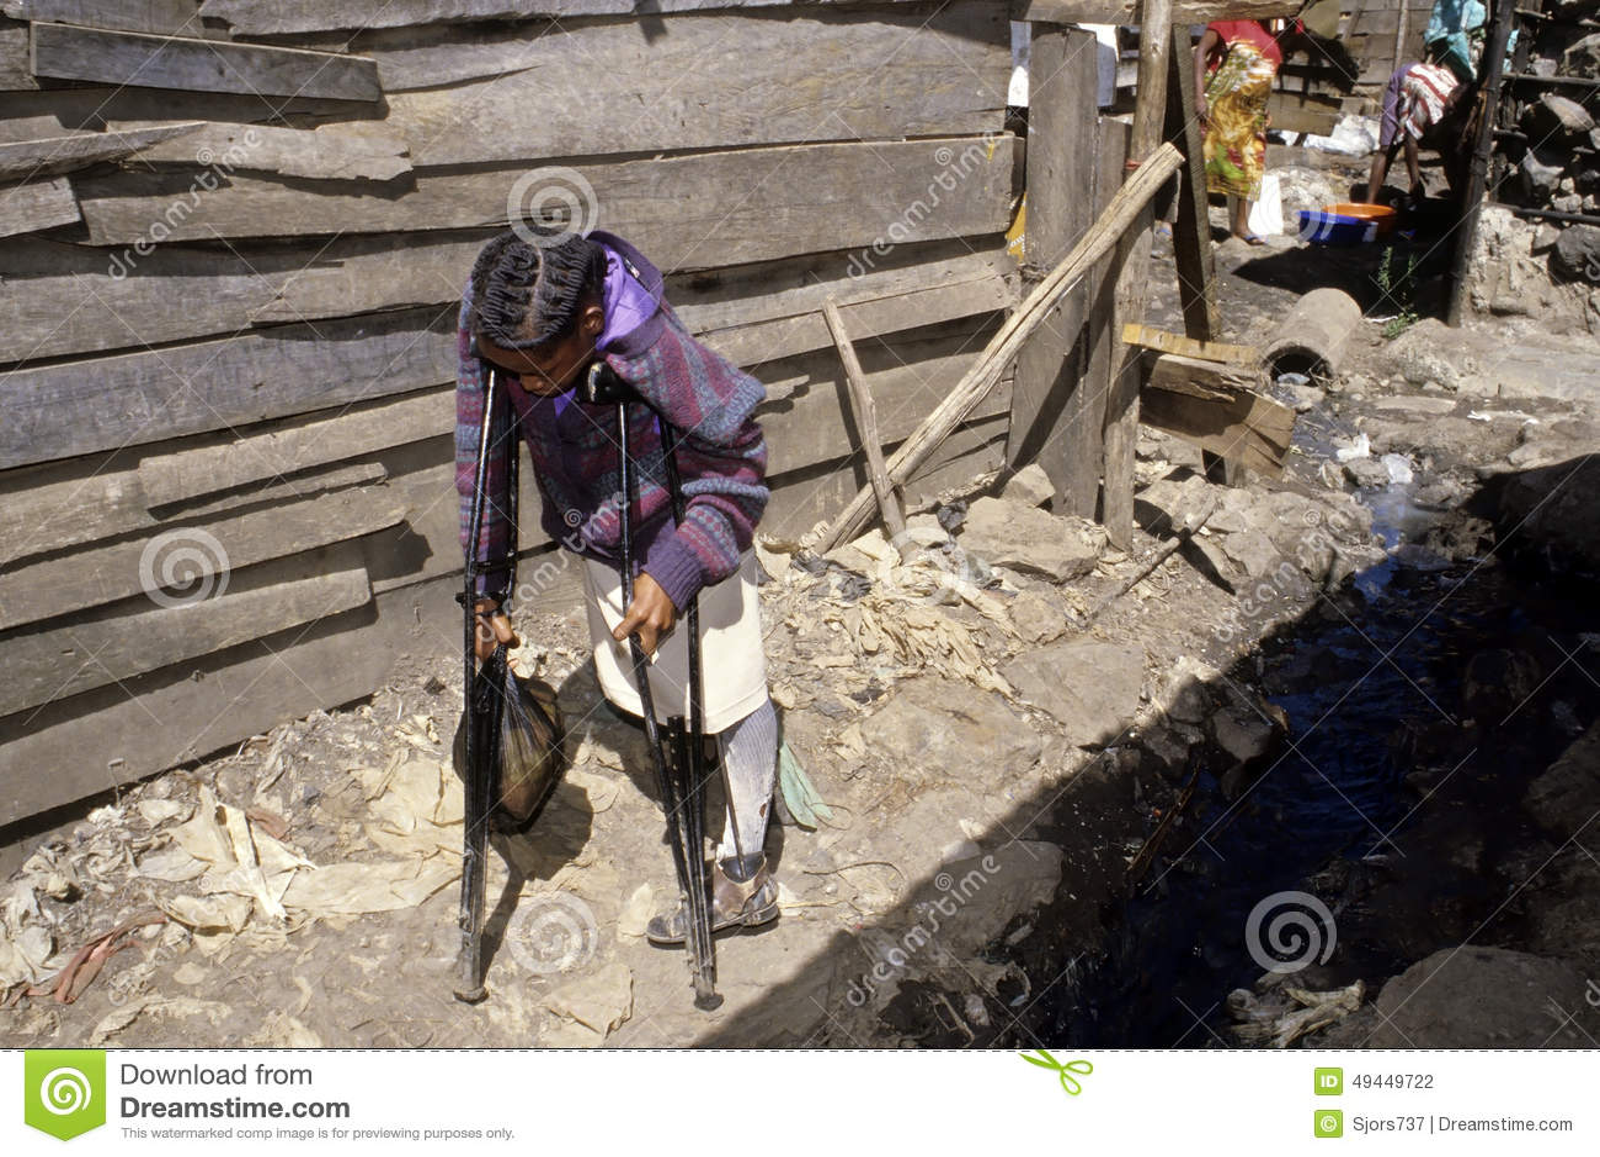 Vie difficile avec l incapacité, taudis kenyan, Nairobi